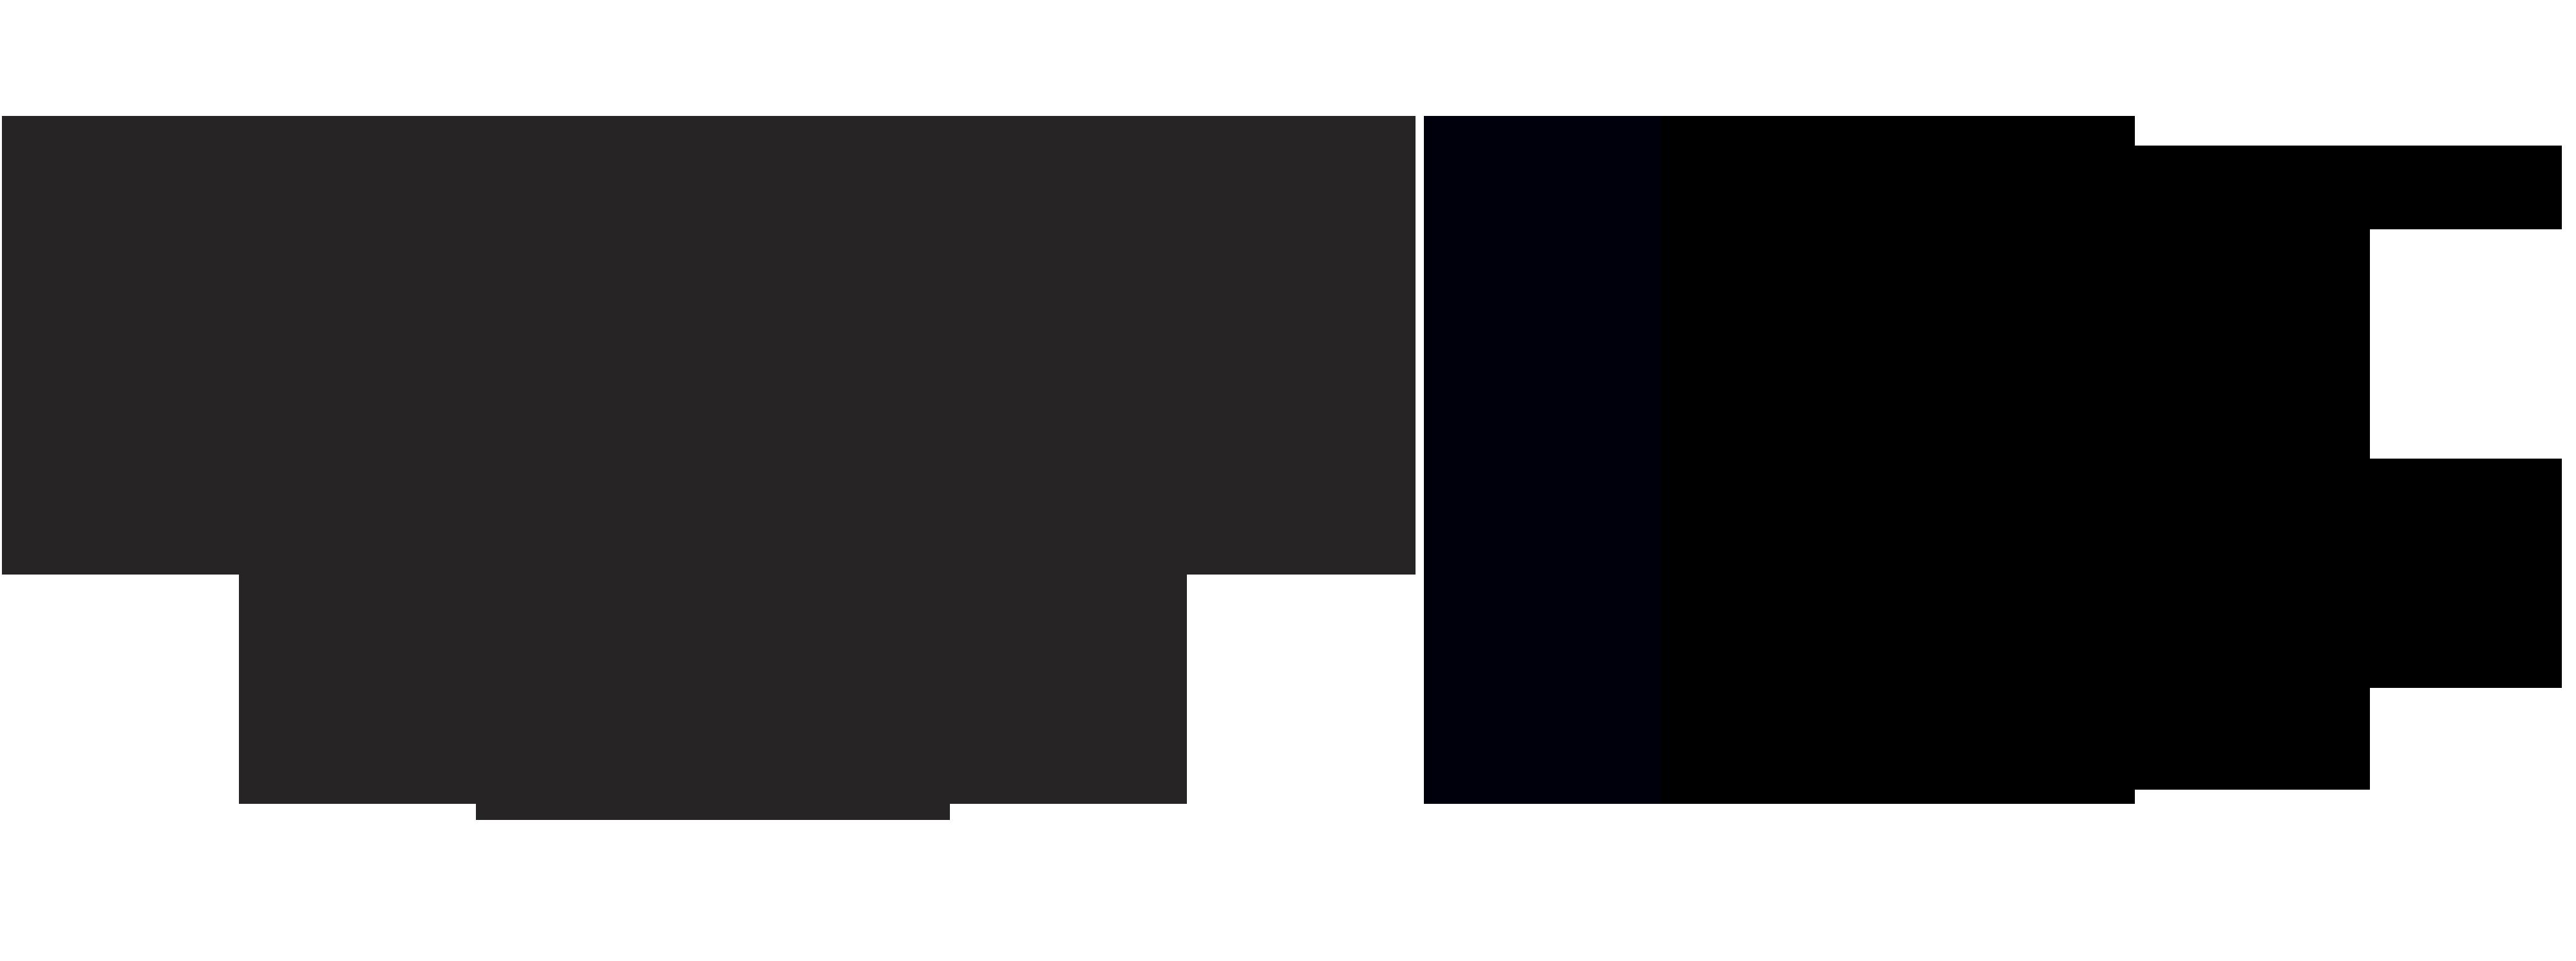 Botanicals Bakewell